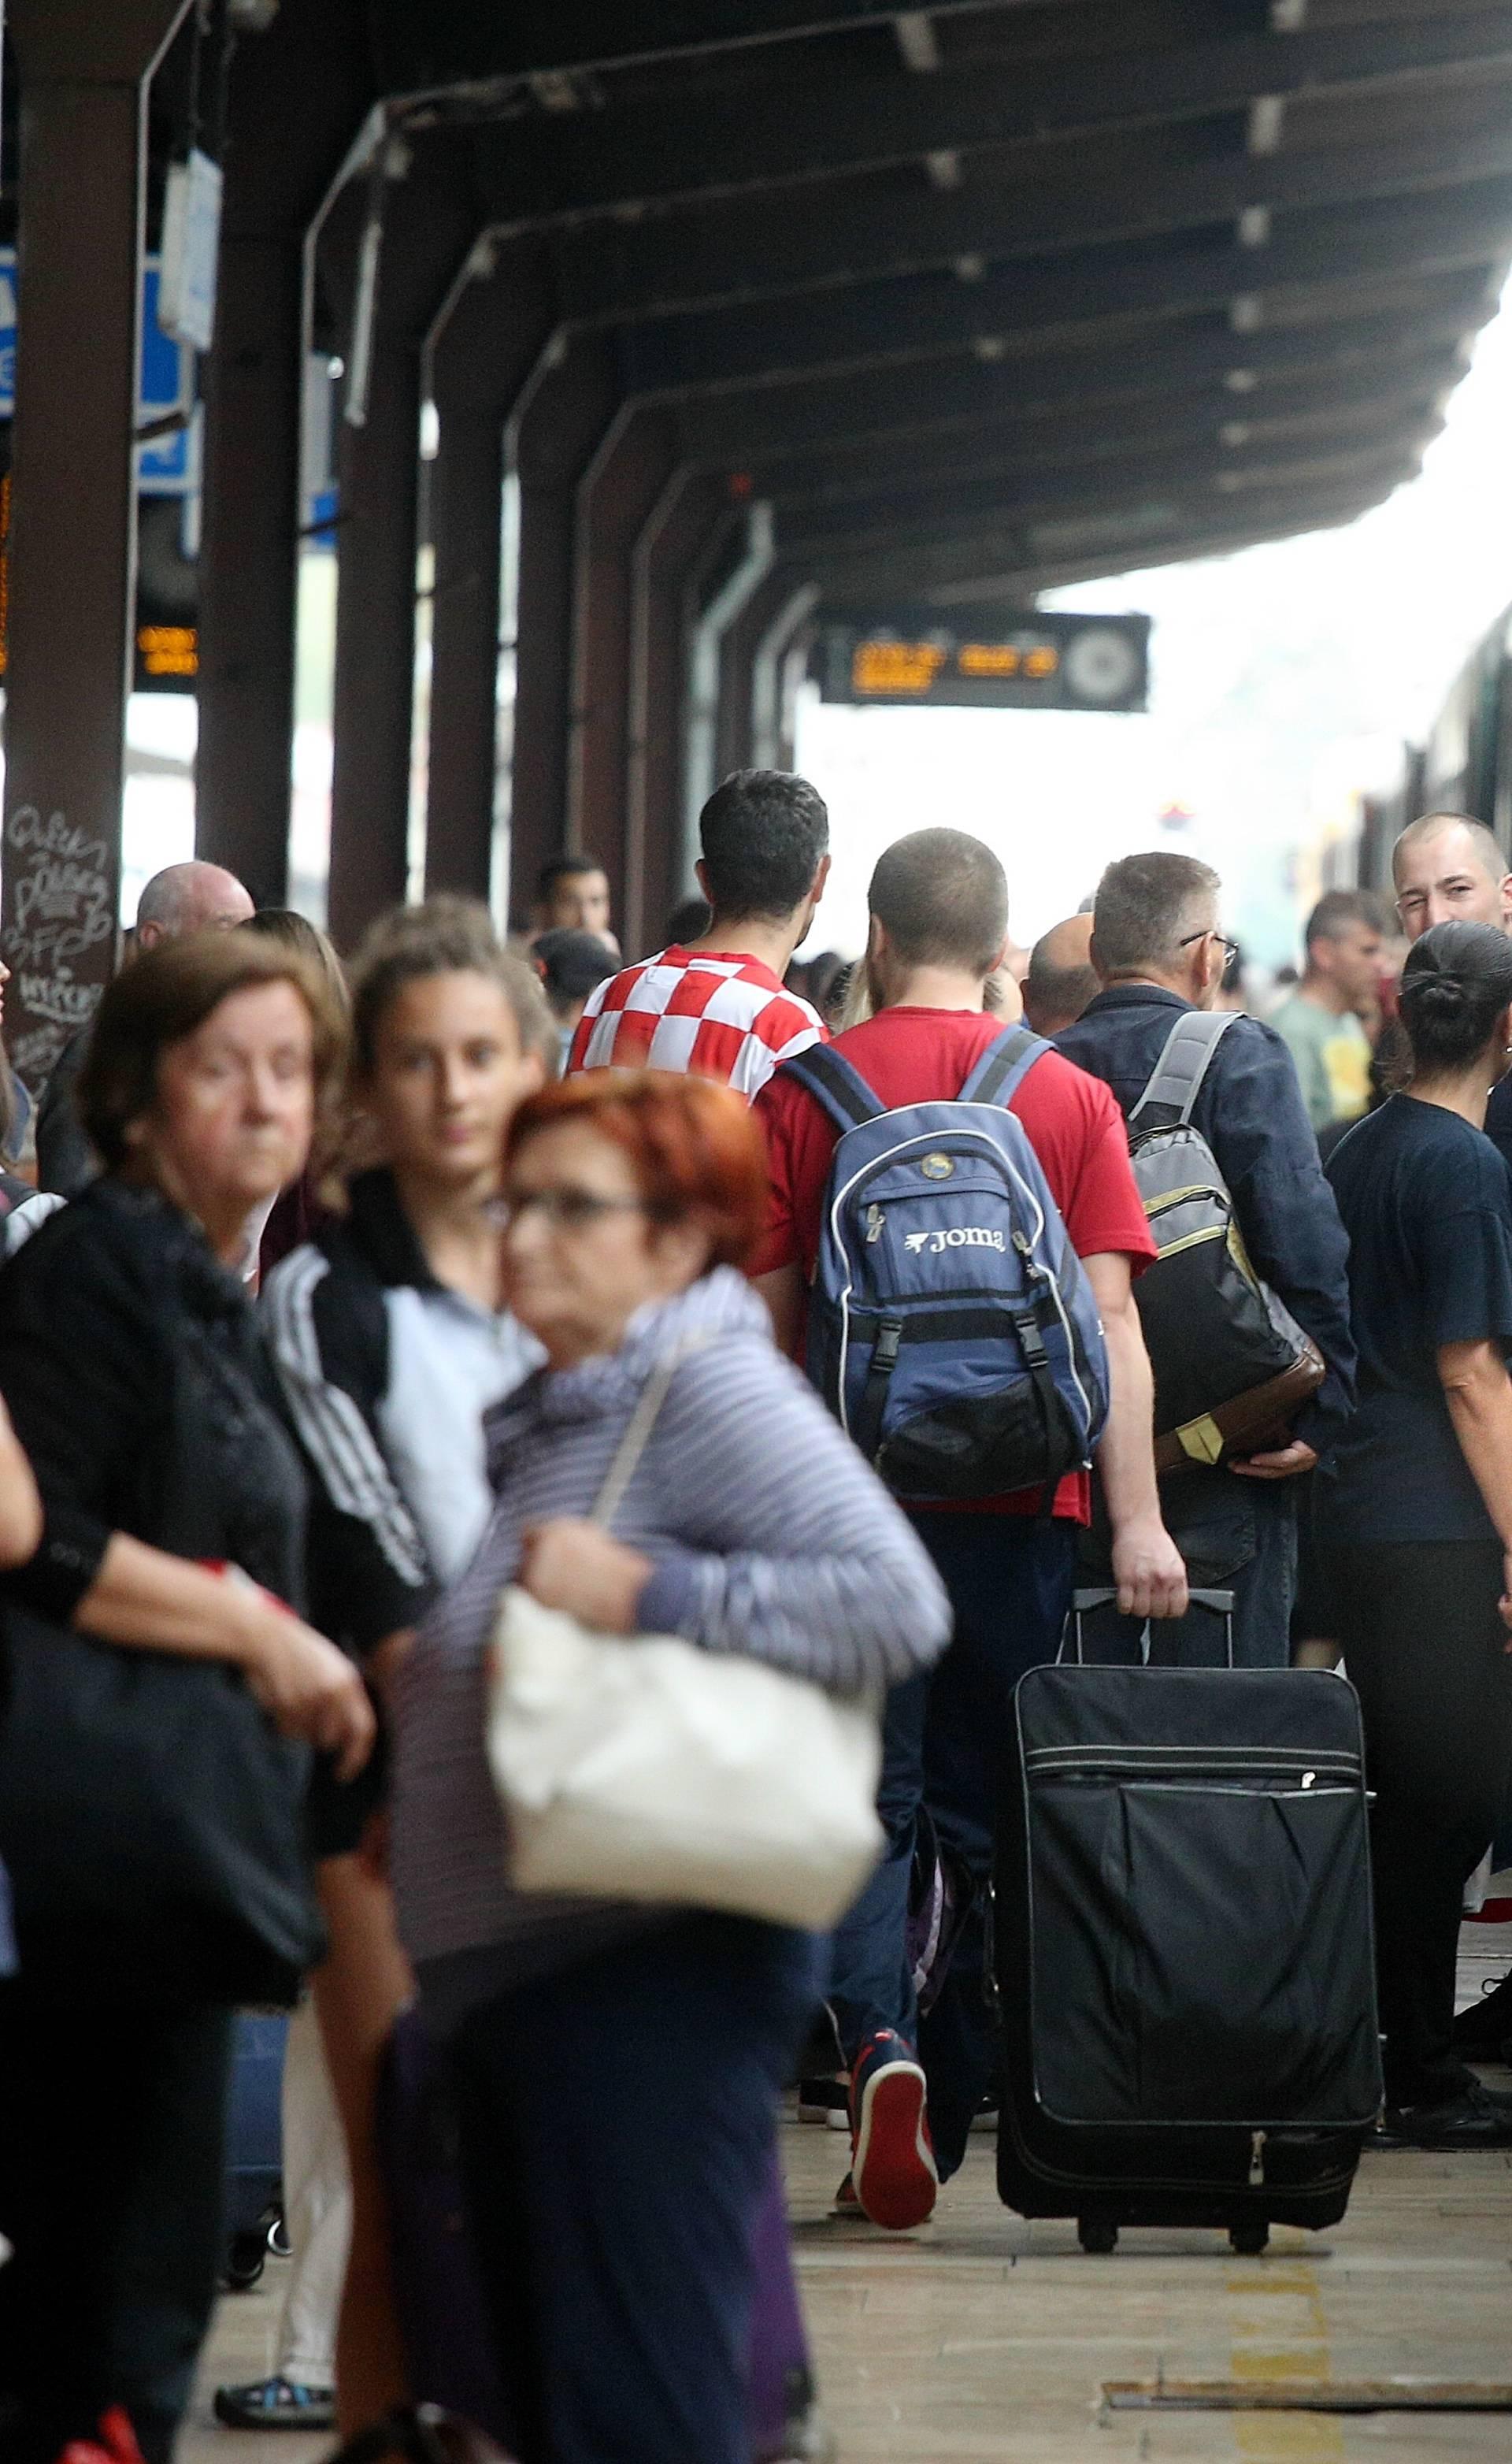 U štrajk idu i željezničari, od HŽ-a traže više konduktera